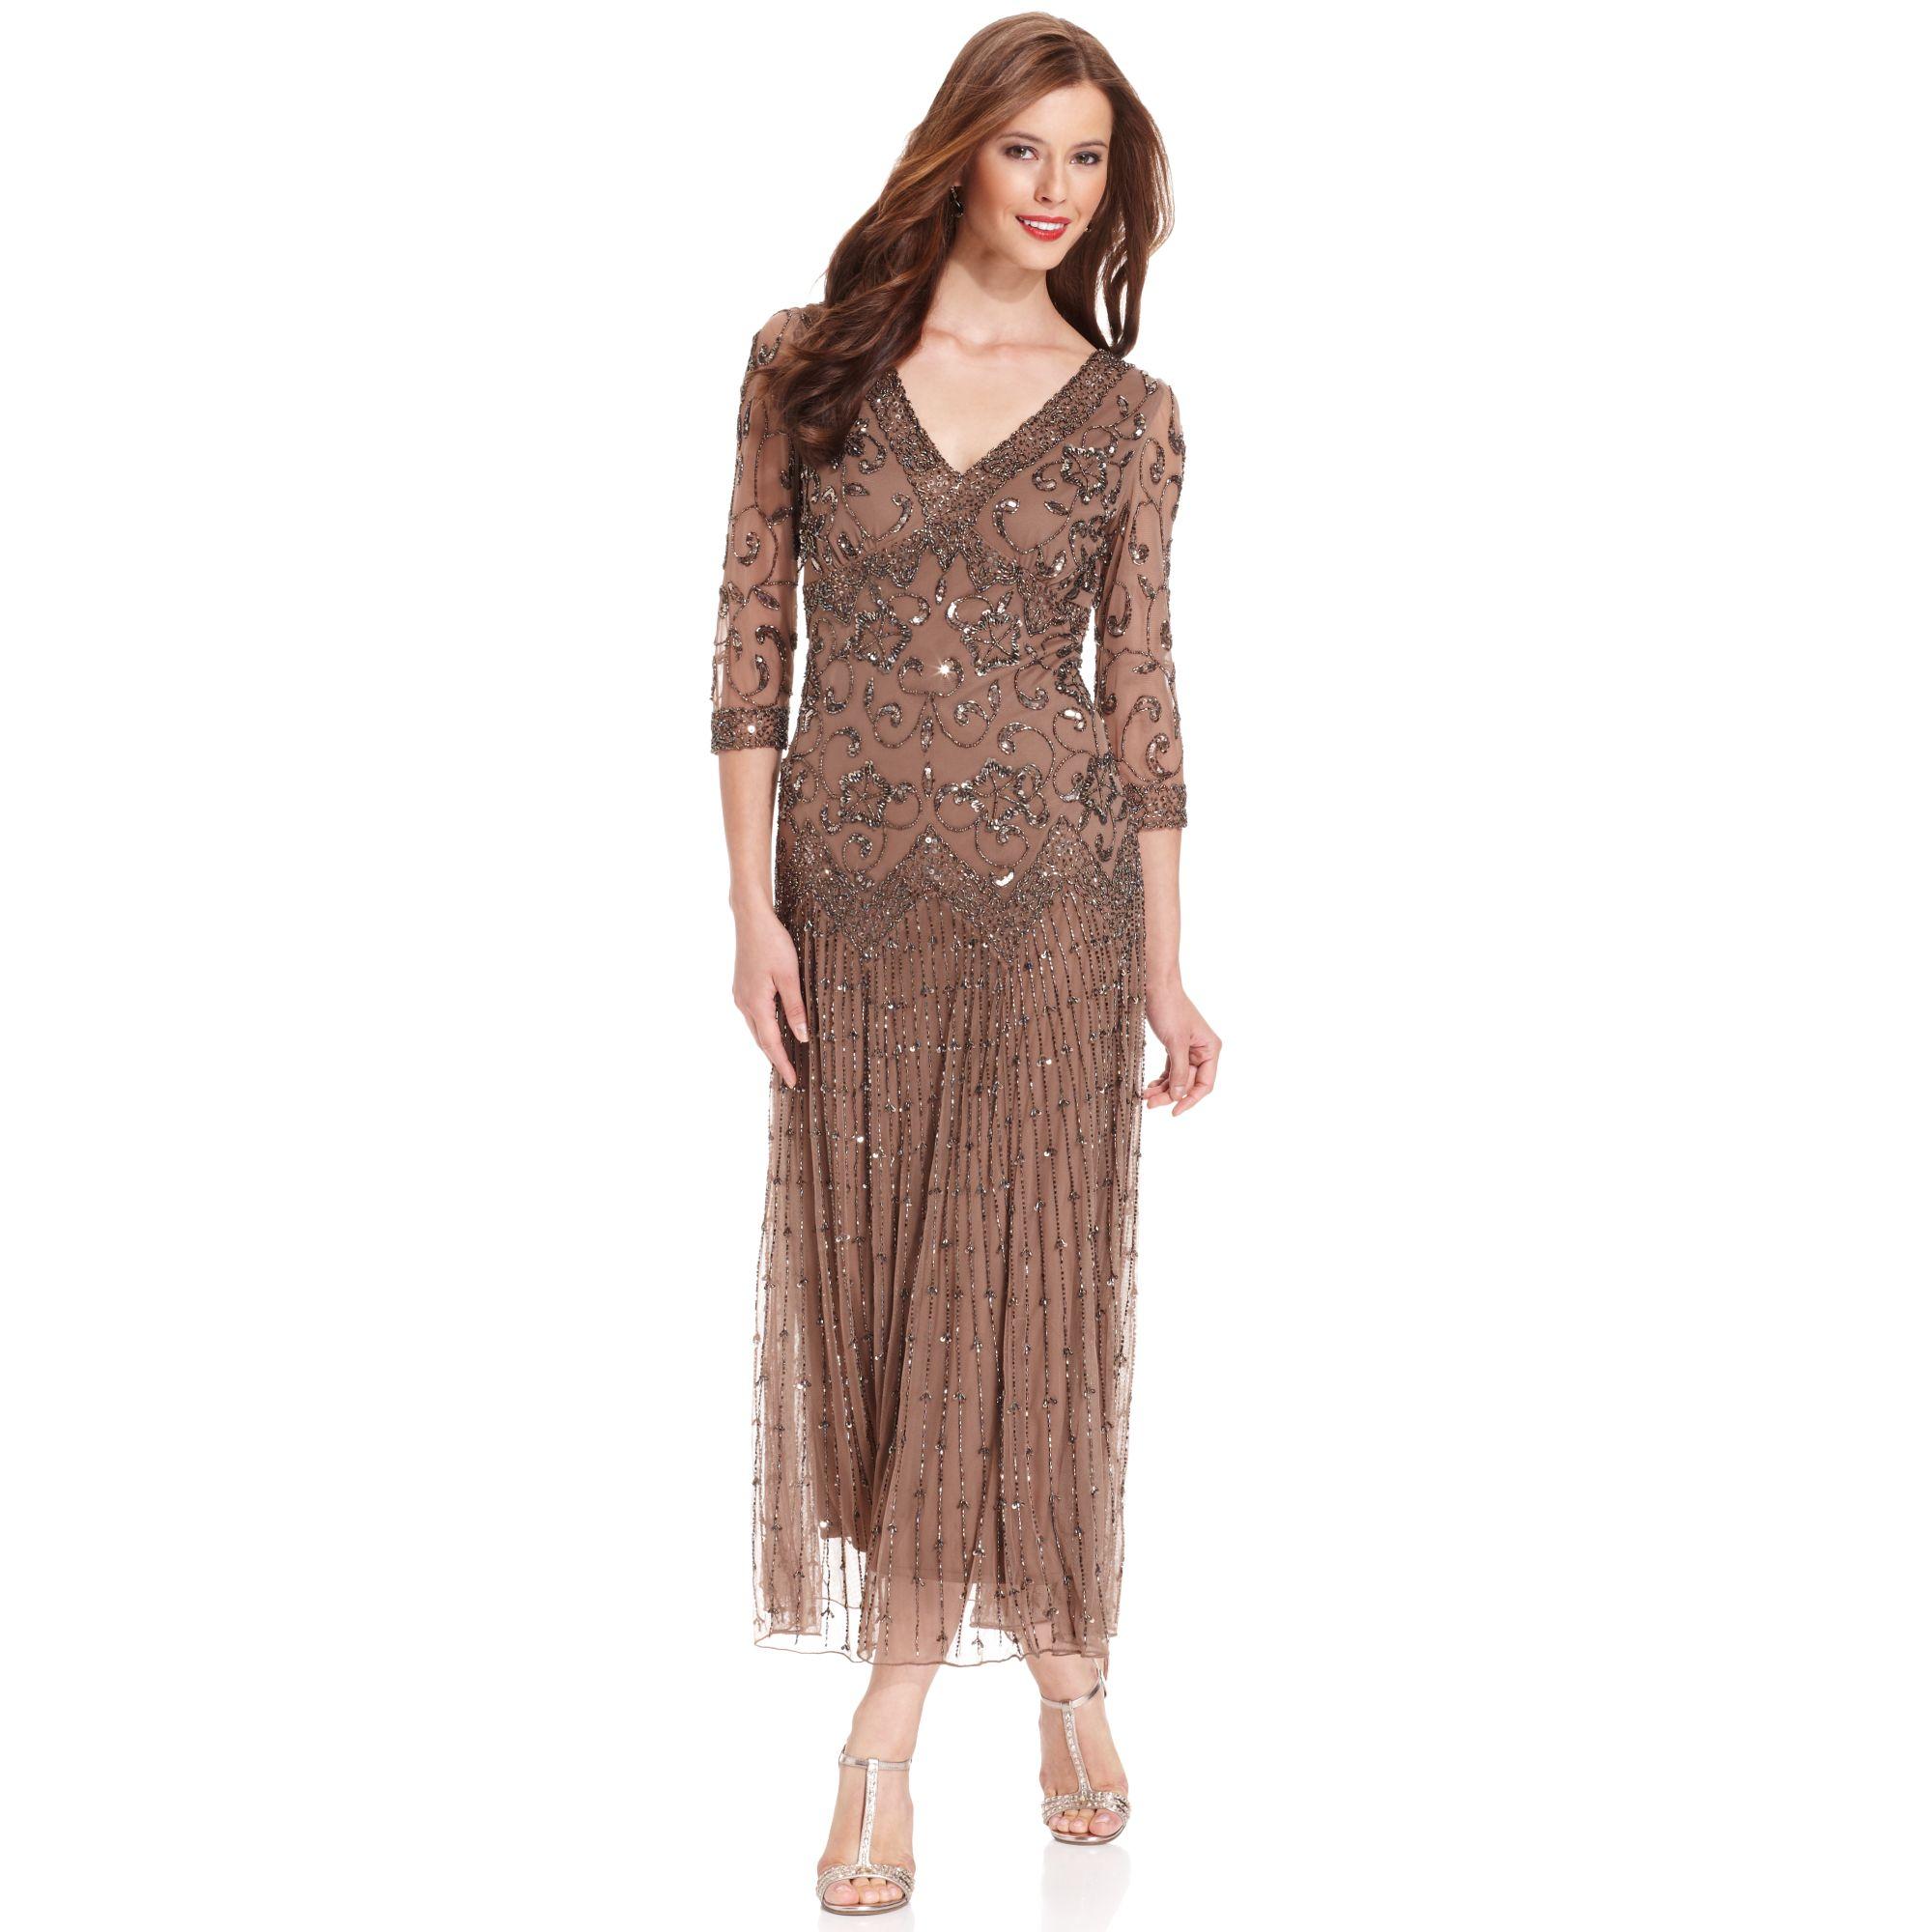 Lyst - Pisarro Nights Threequarter Sleeve Beaded Gown in Brown